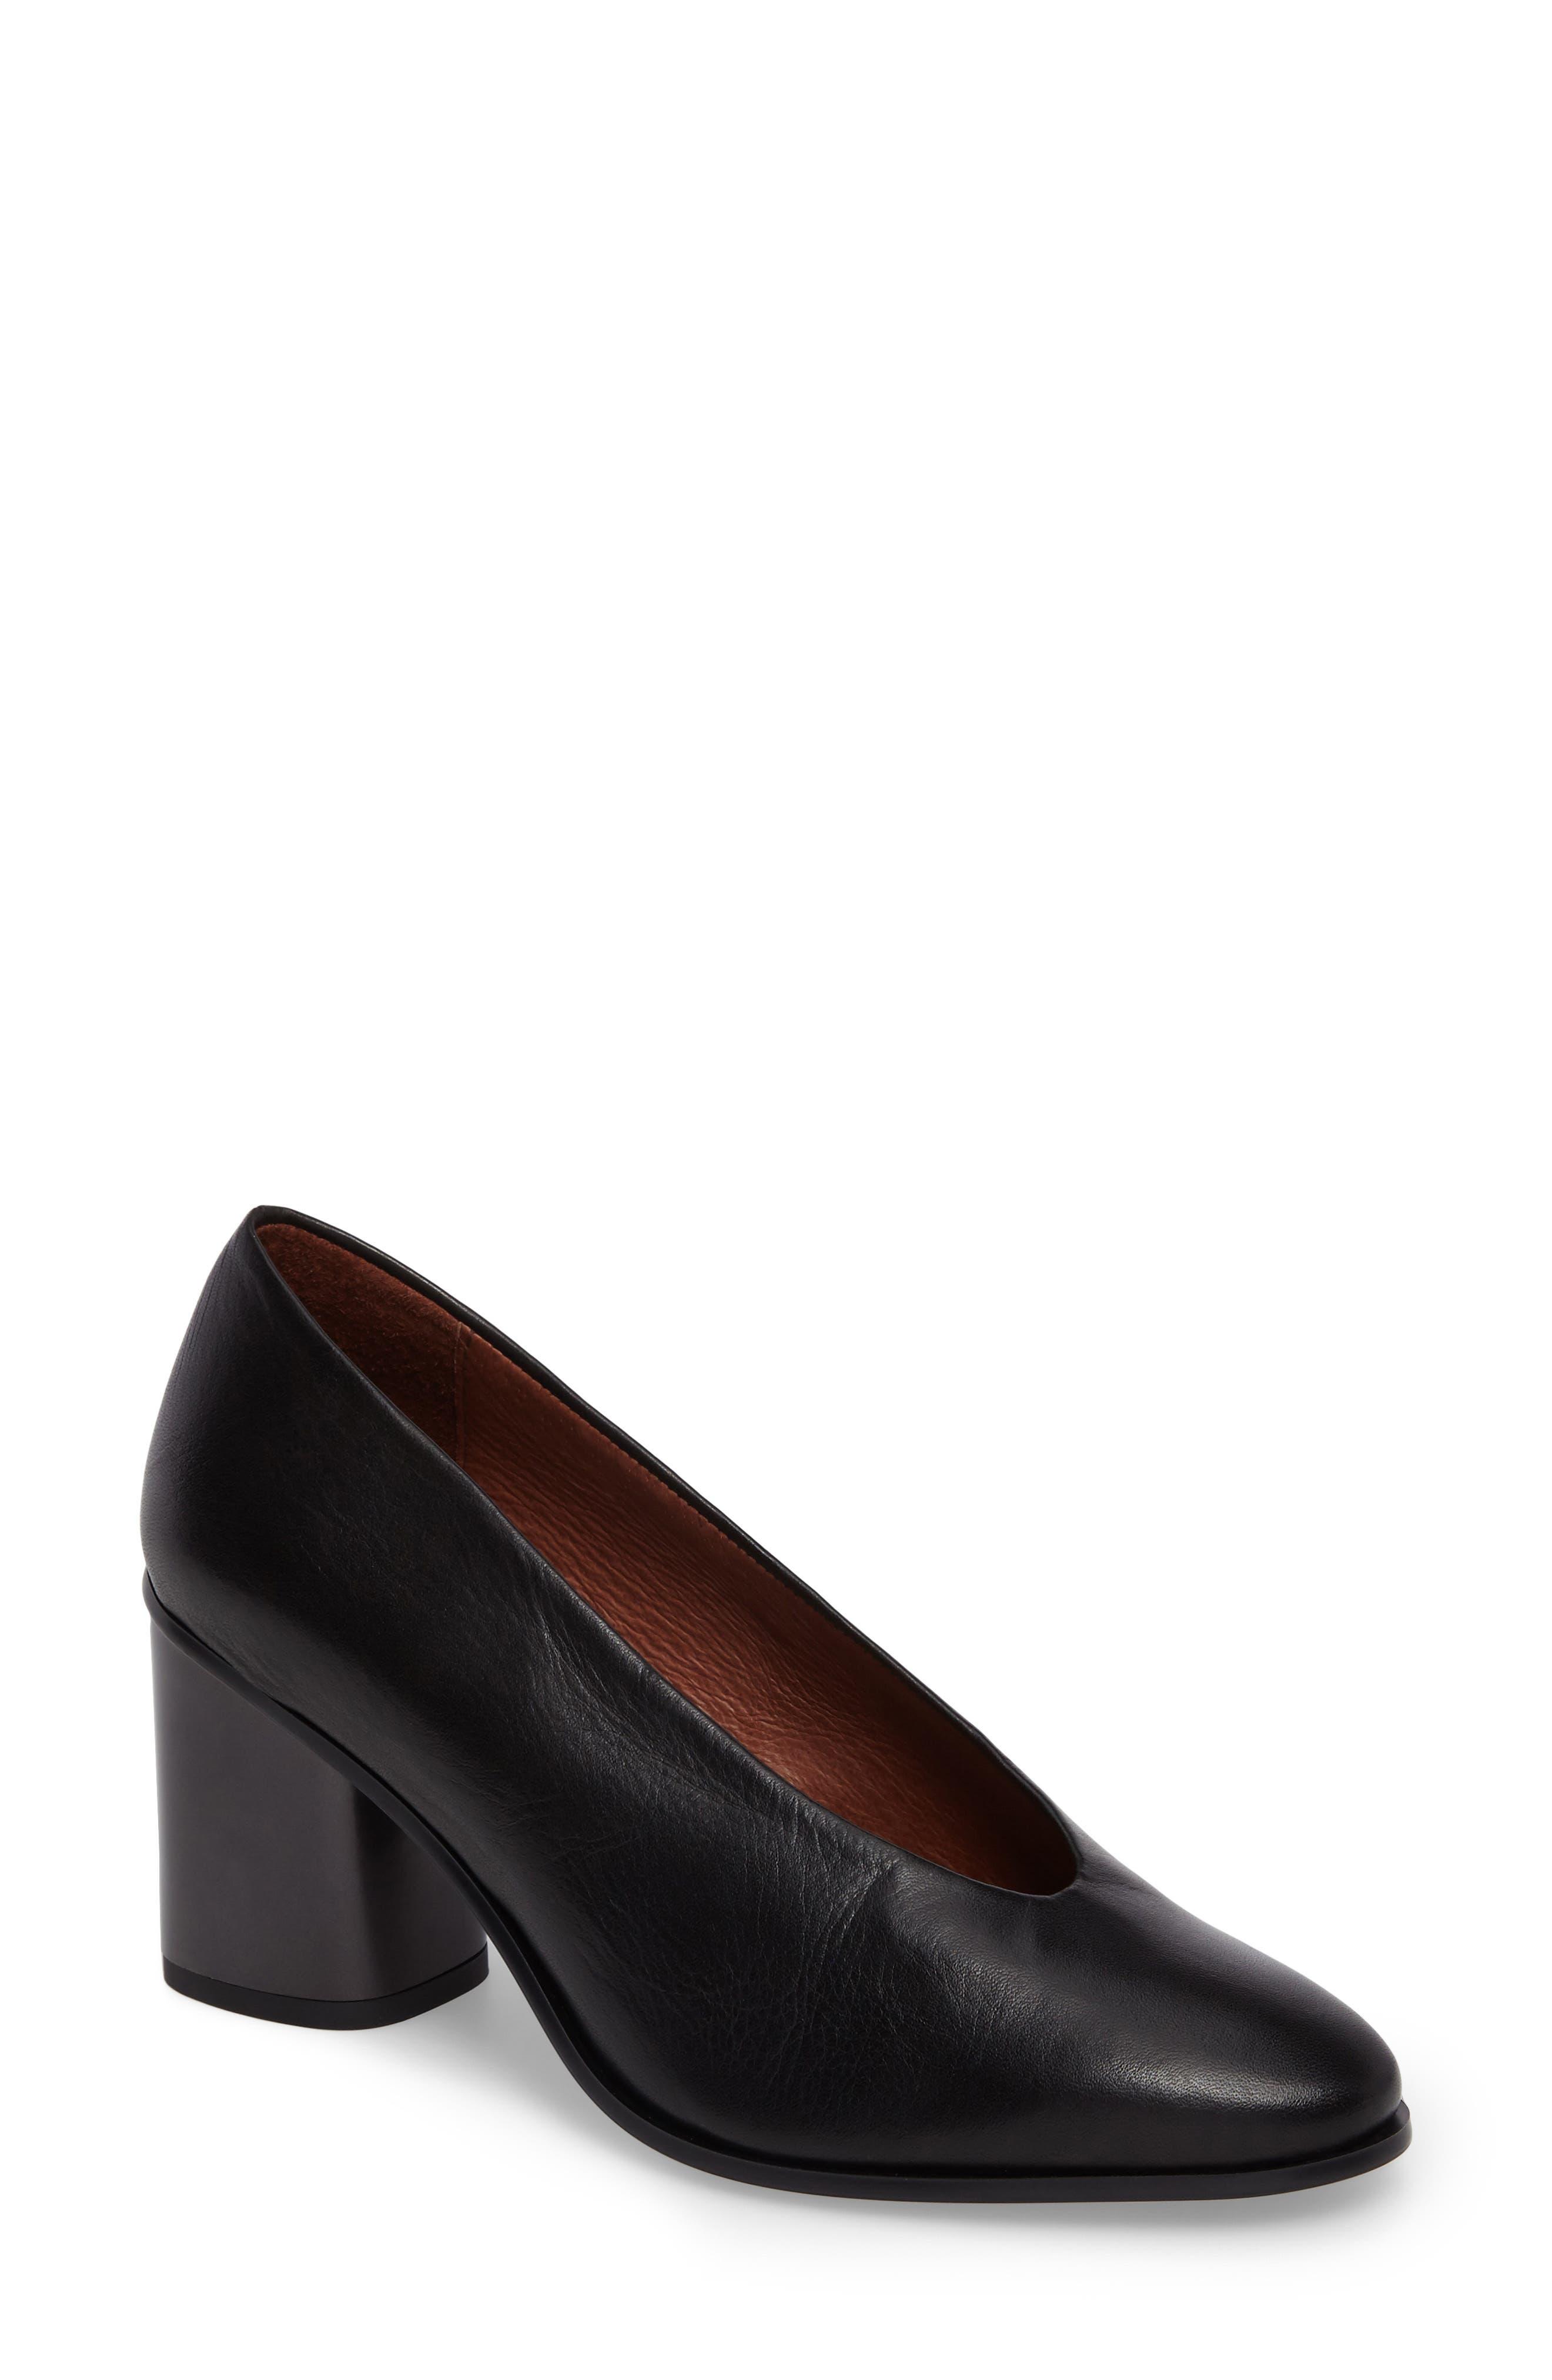 Maddie Block Heel Pump,                         Main,                         color, Soho Black Leather